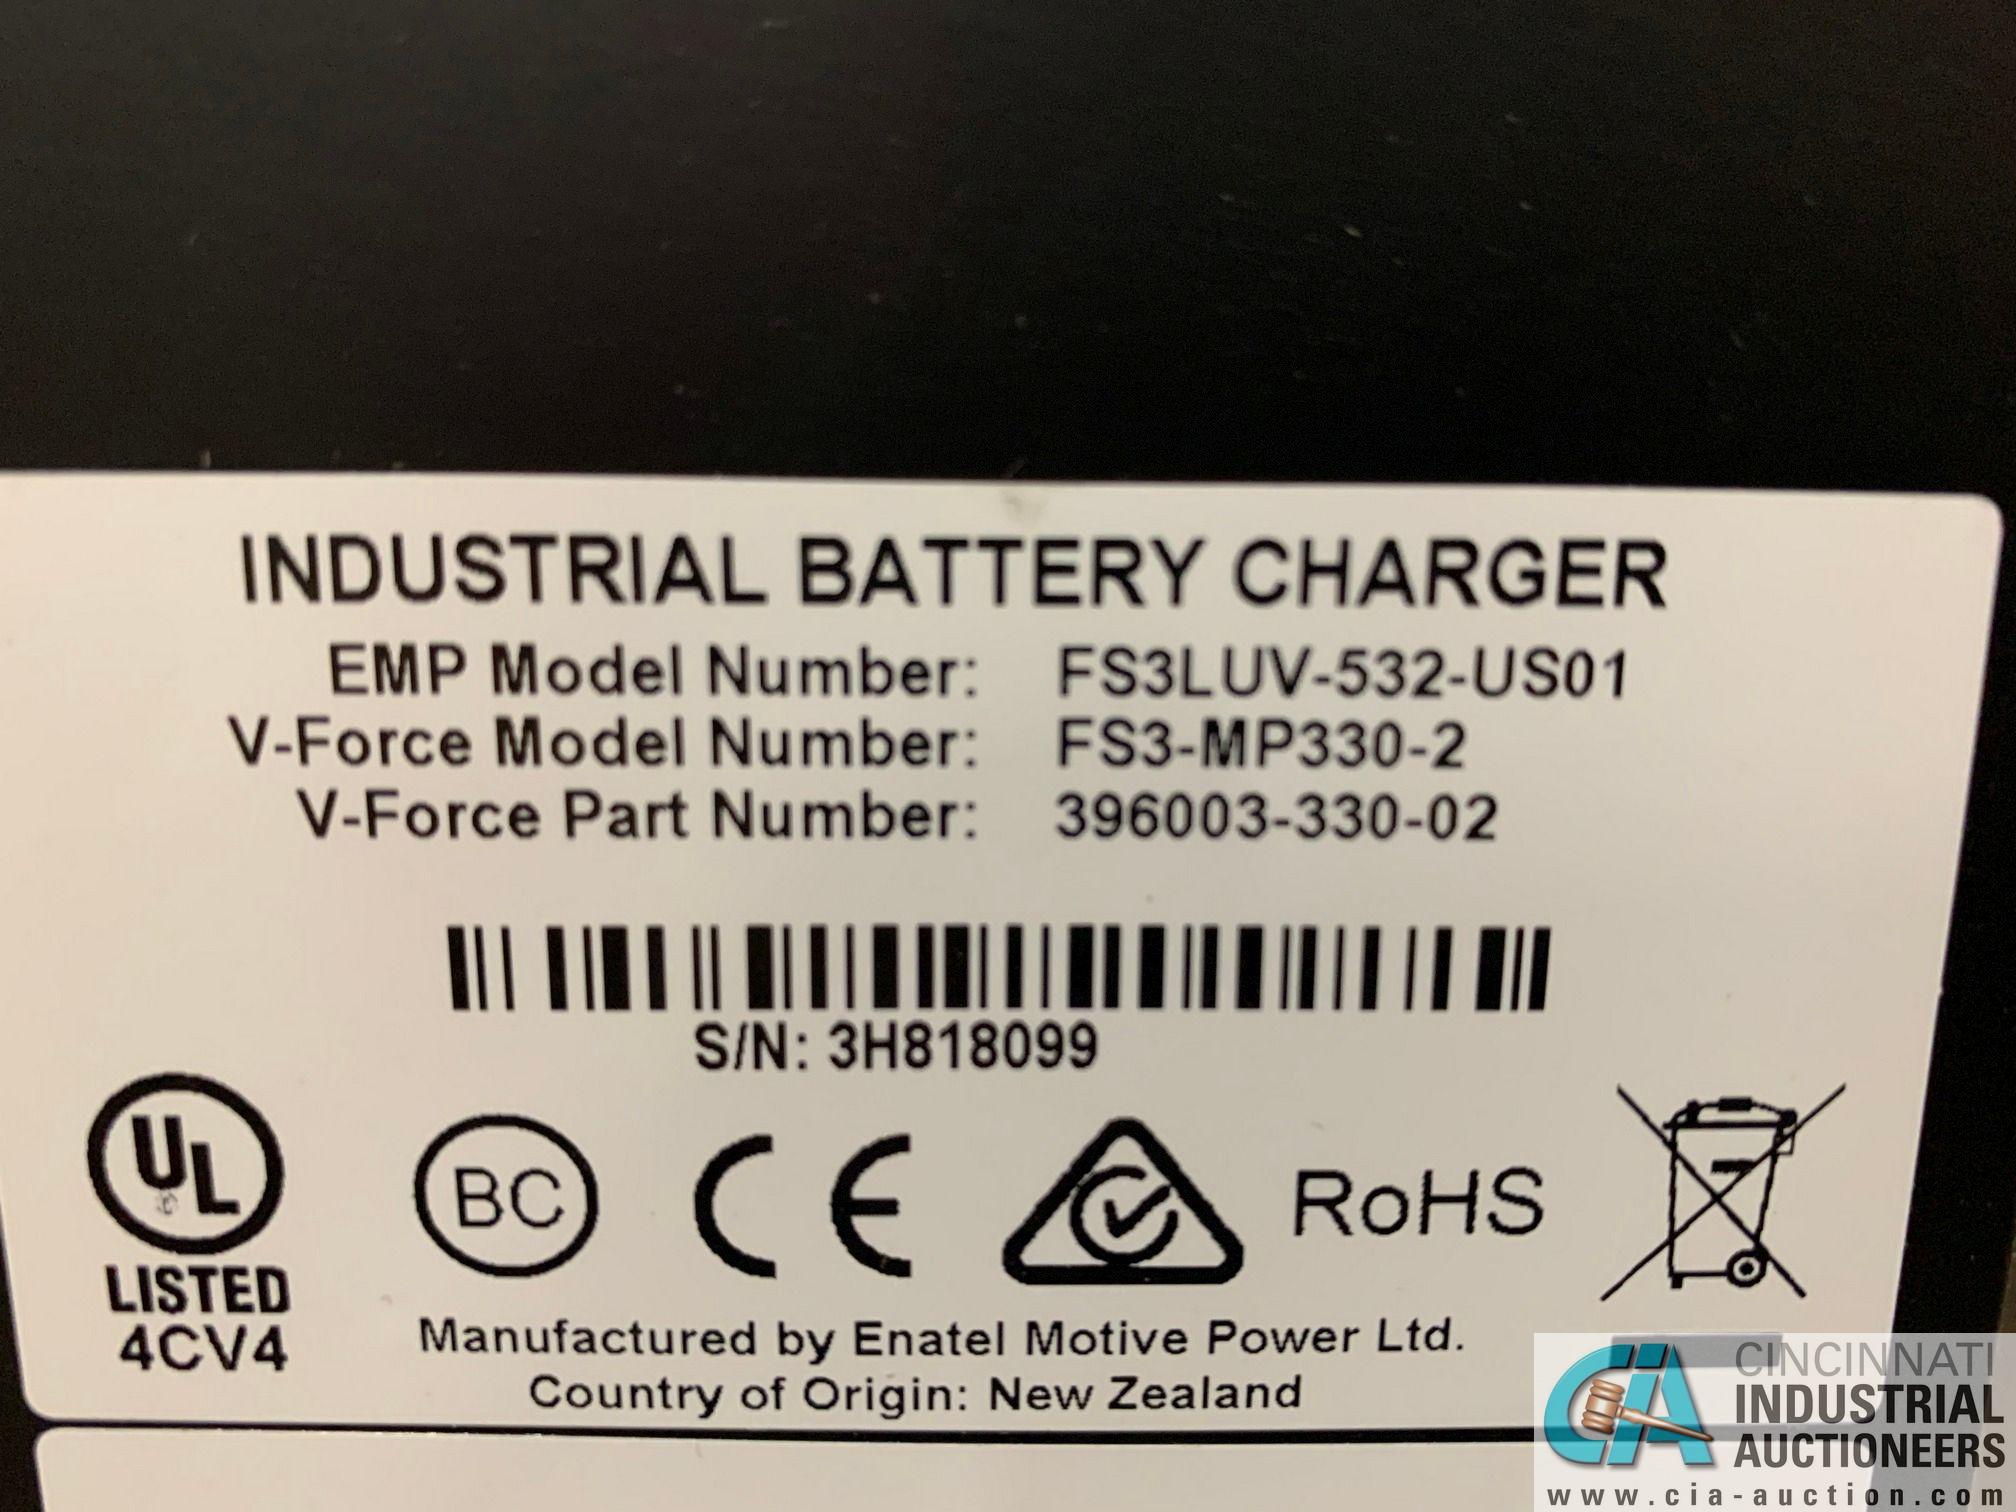 V-FORCE MODEL FS3-MP330-2 BATTERY CHARGER; S/N 3H818099, 36 VOLT, NO STAND - Image 3 of 6